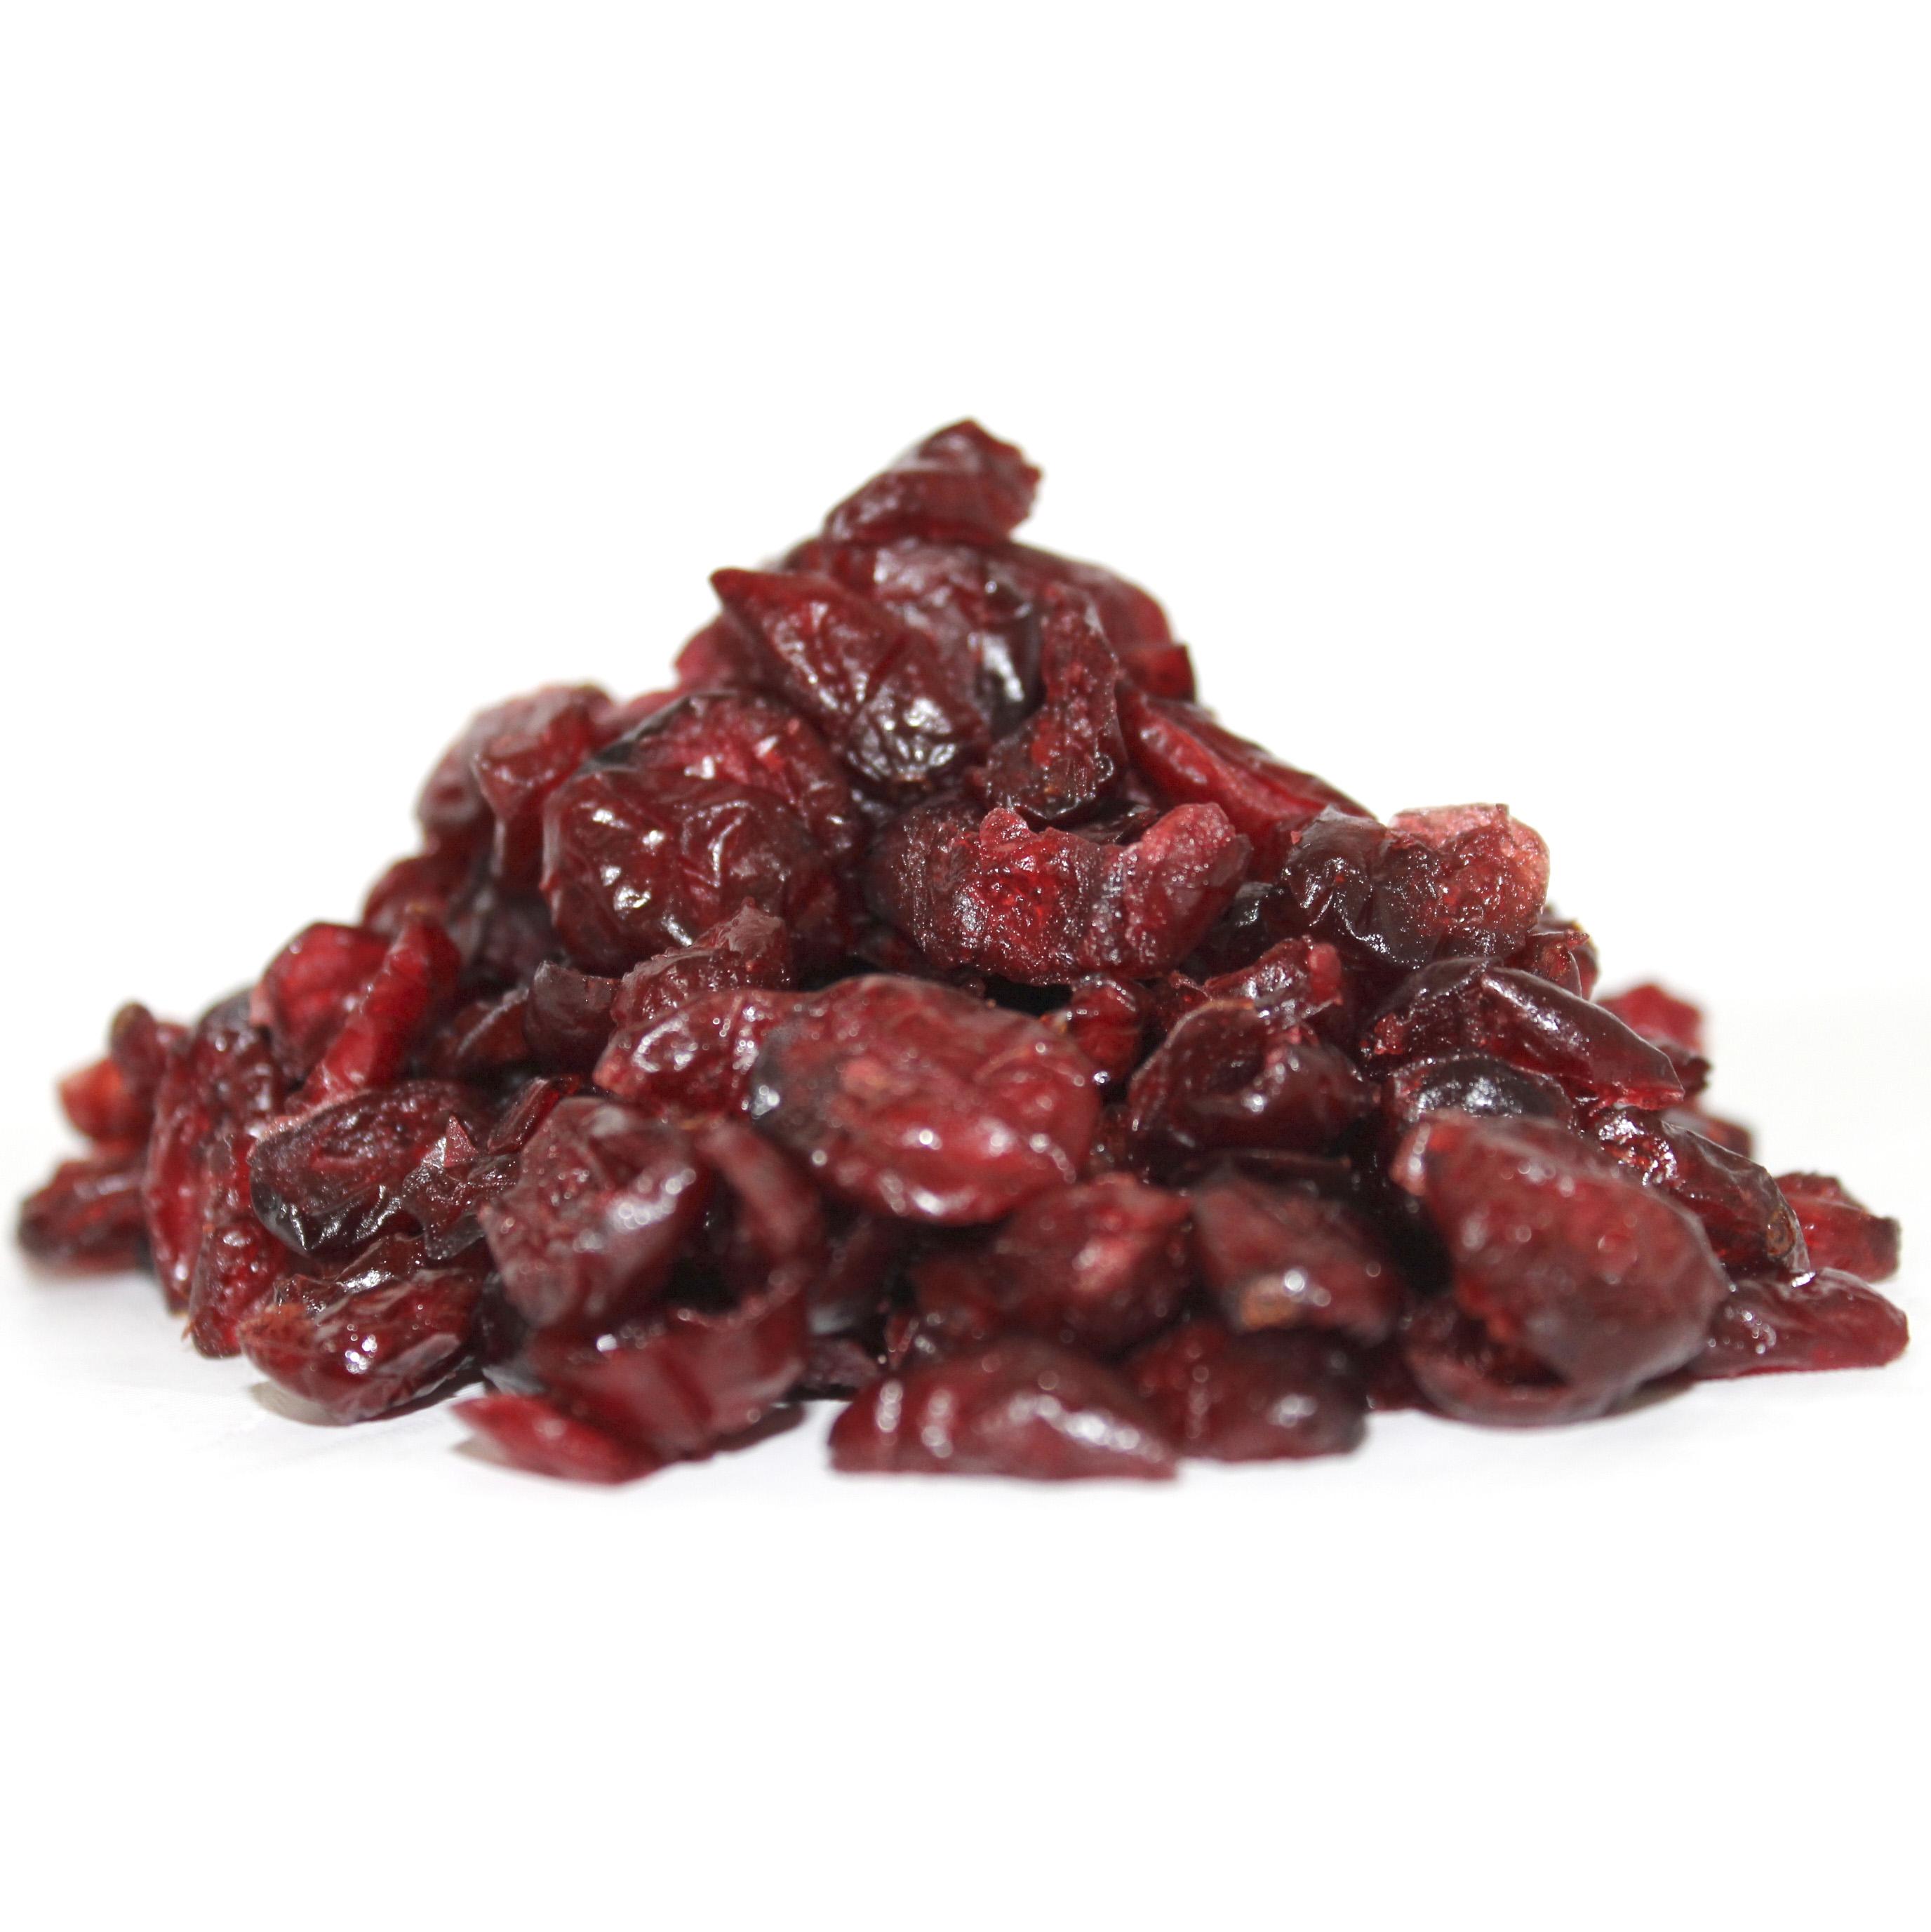 Cranberries - Pineapple Juice Infused